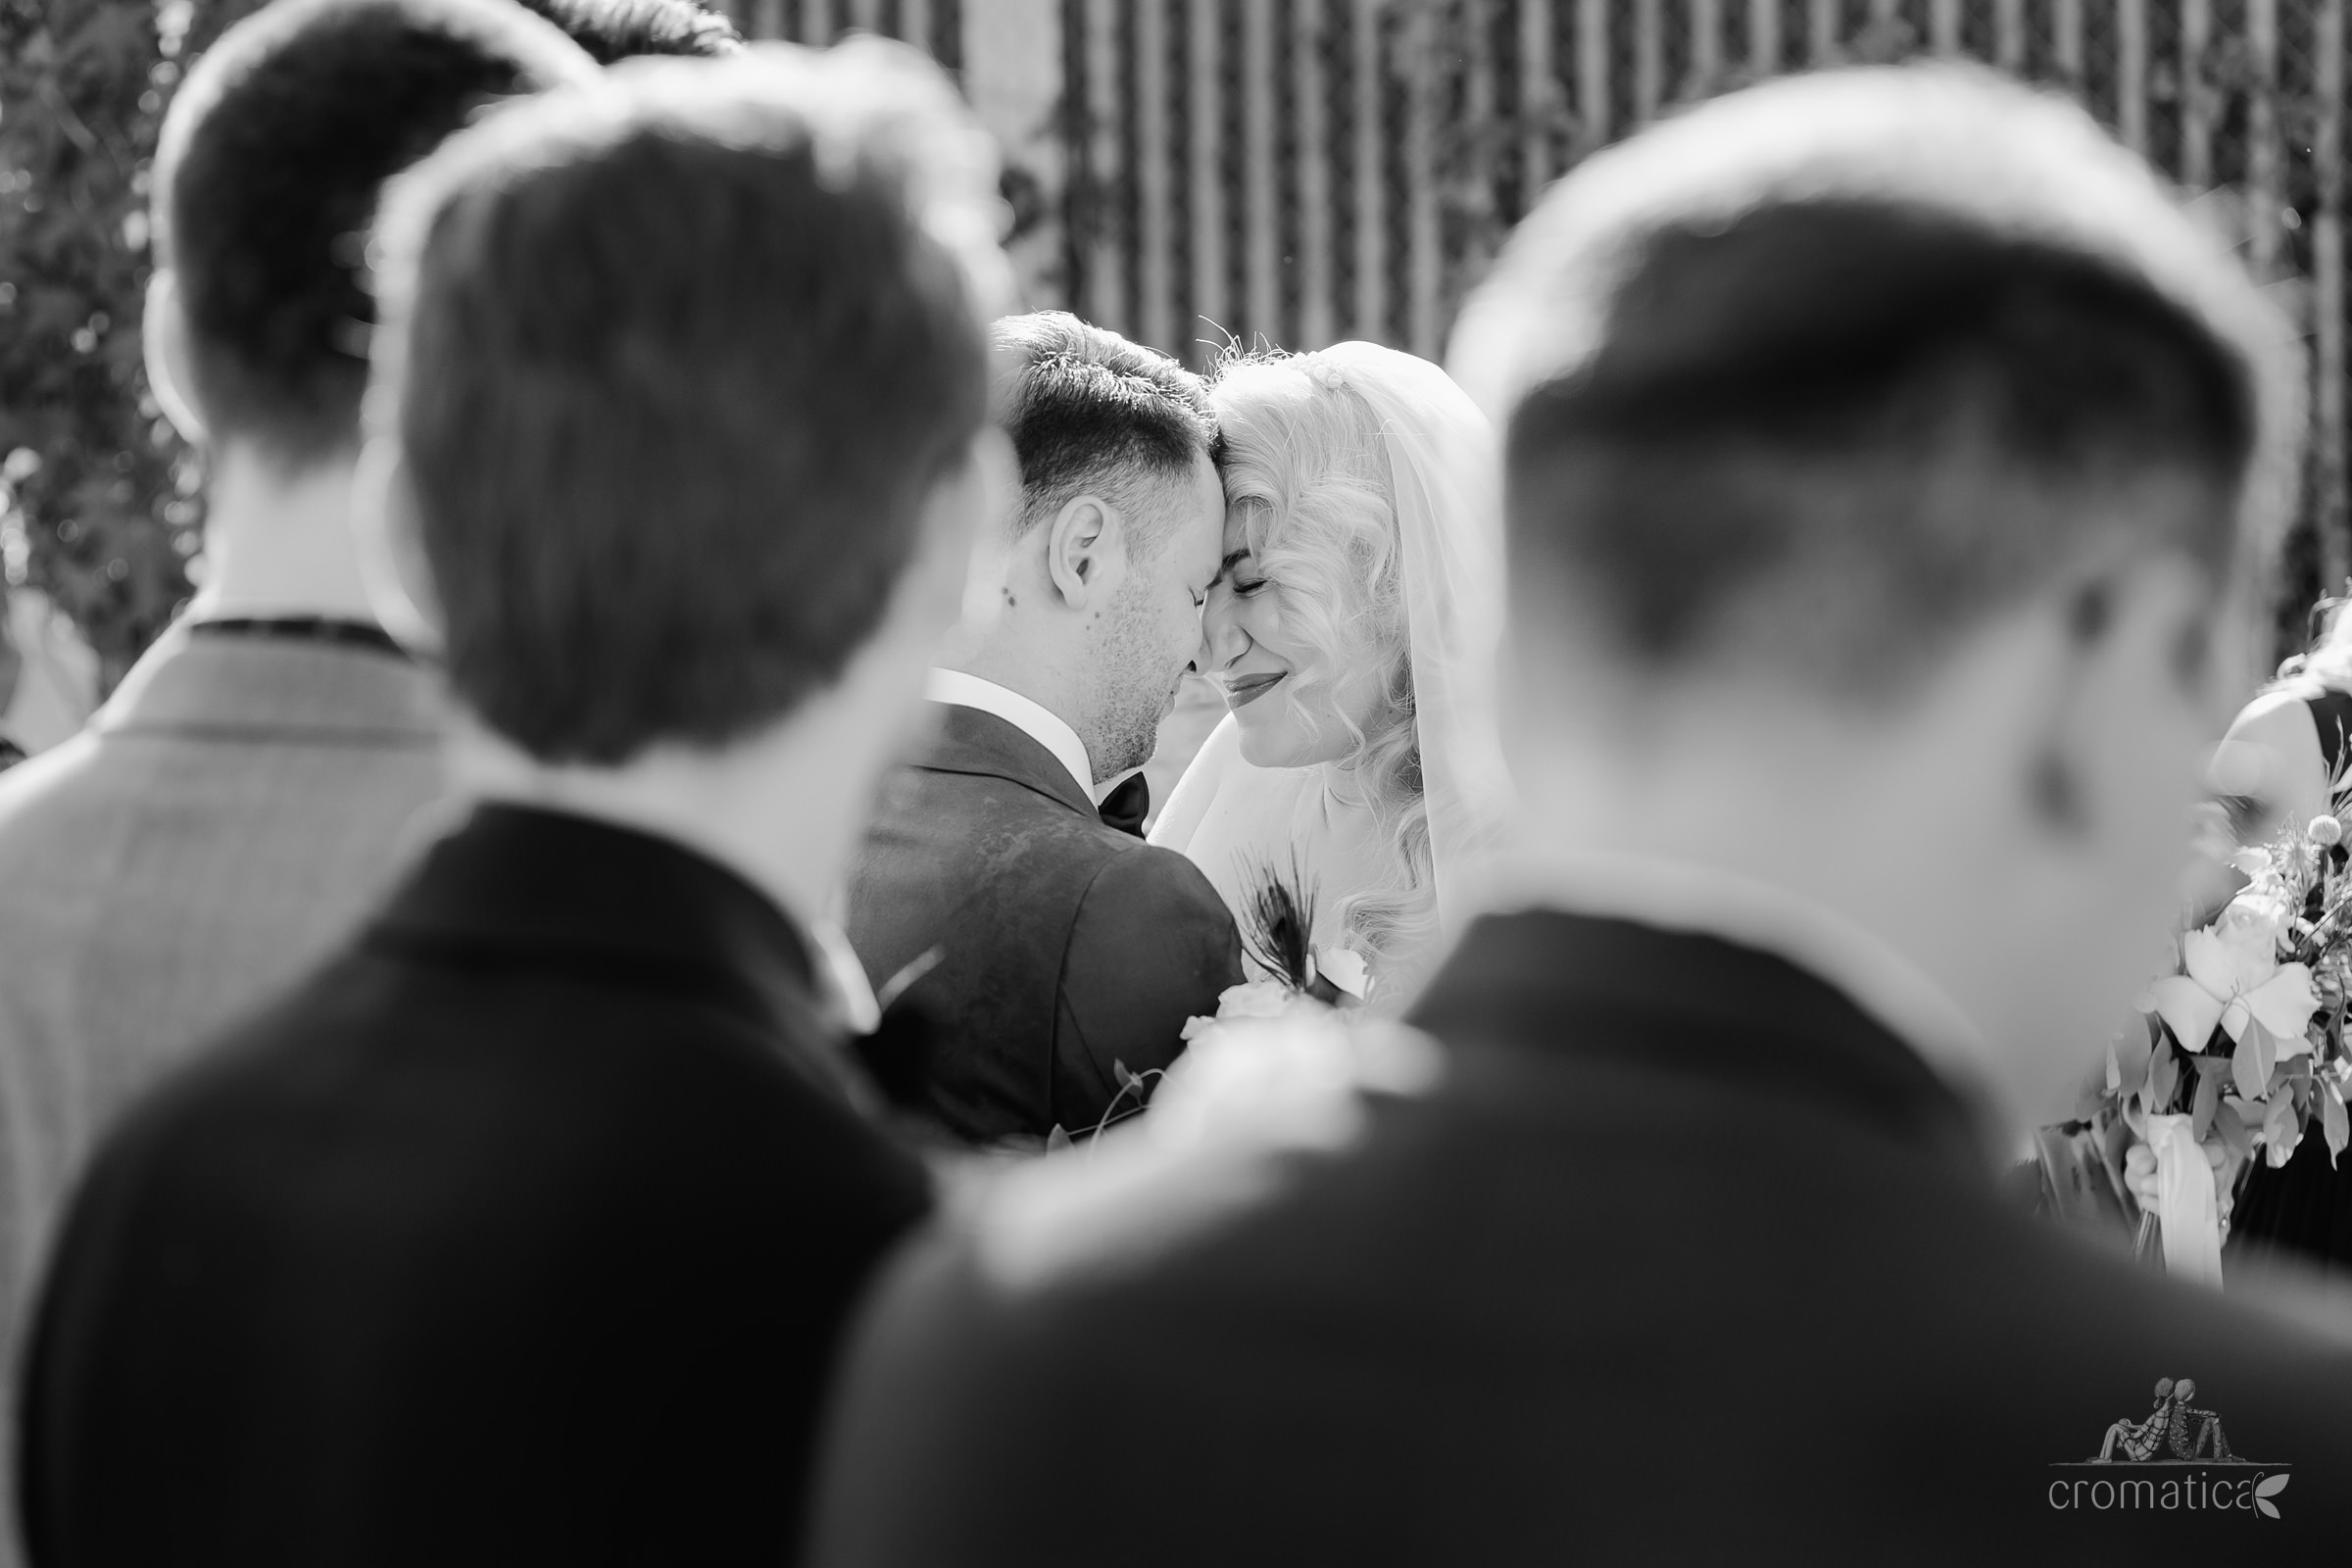 ana mihai fotografii nunta gradina lahovari 043